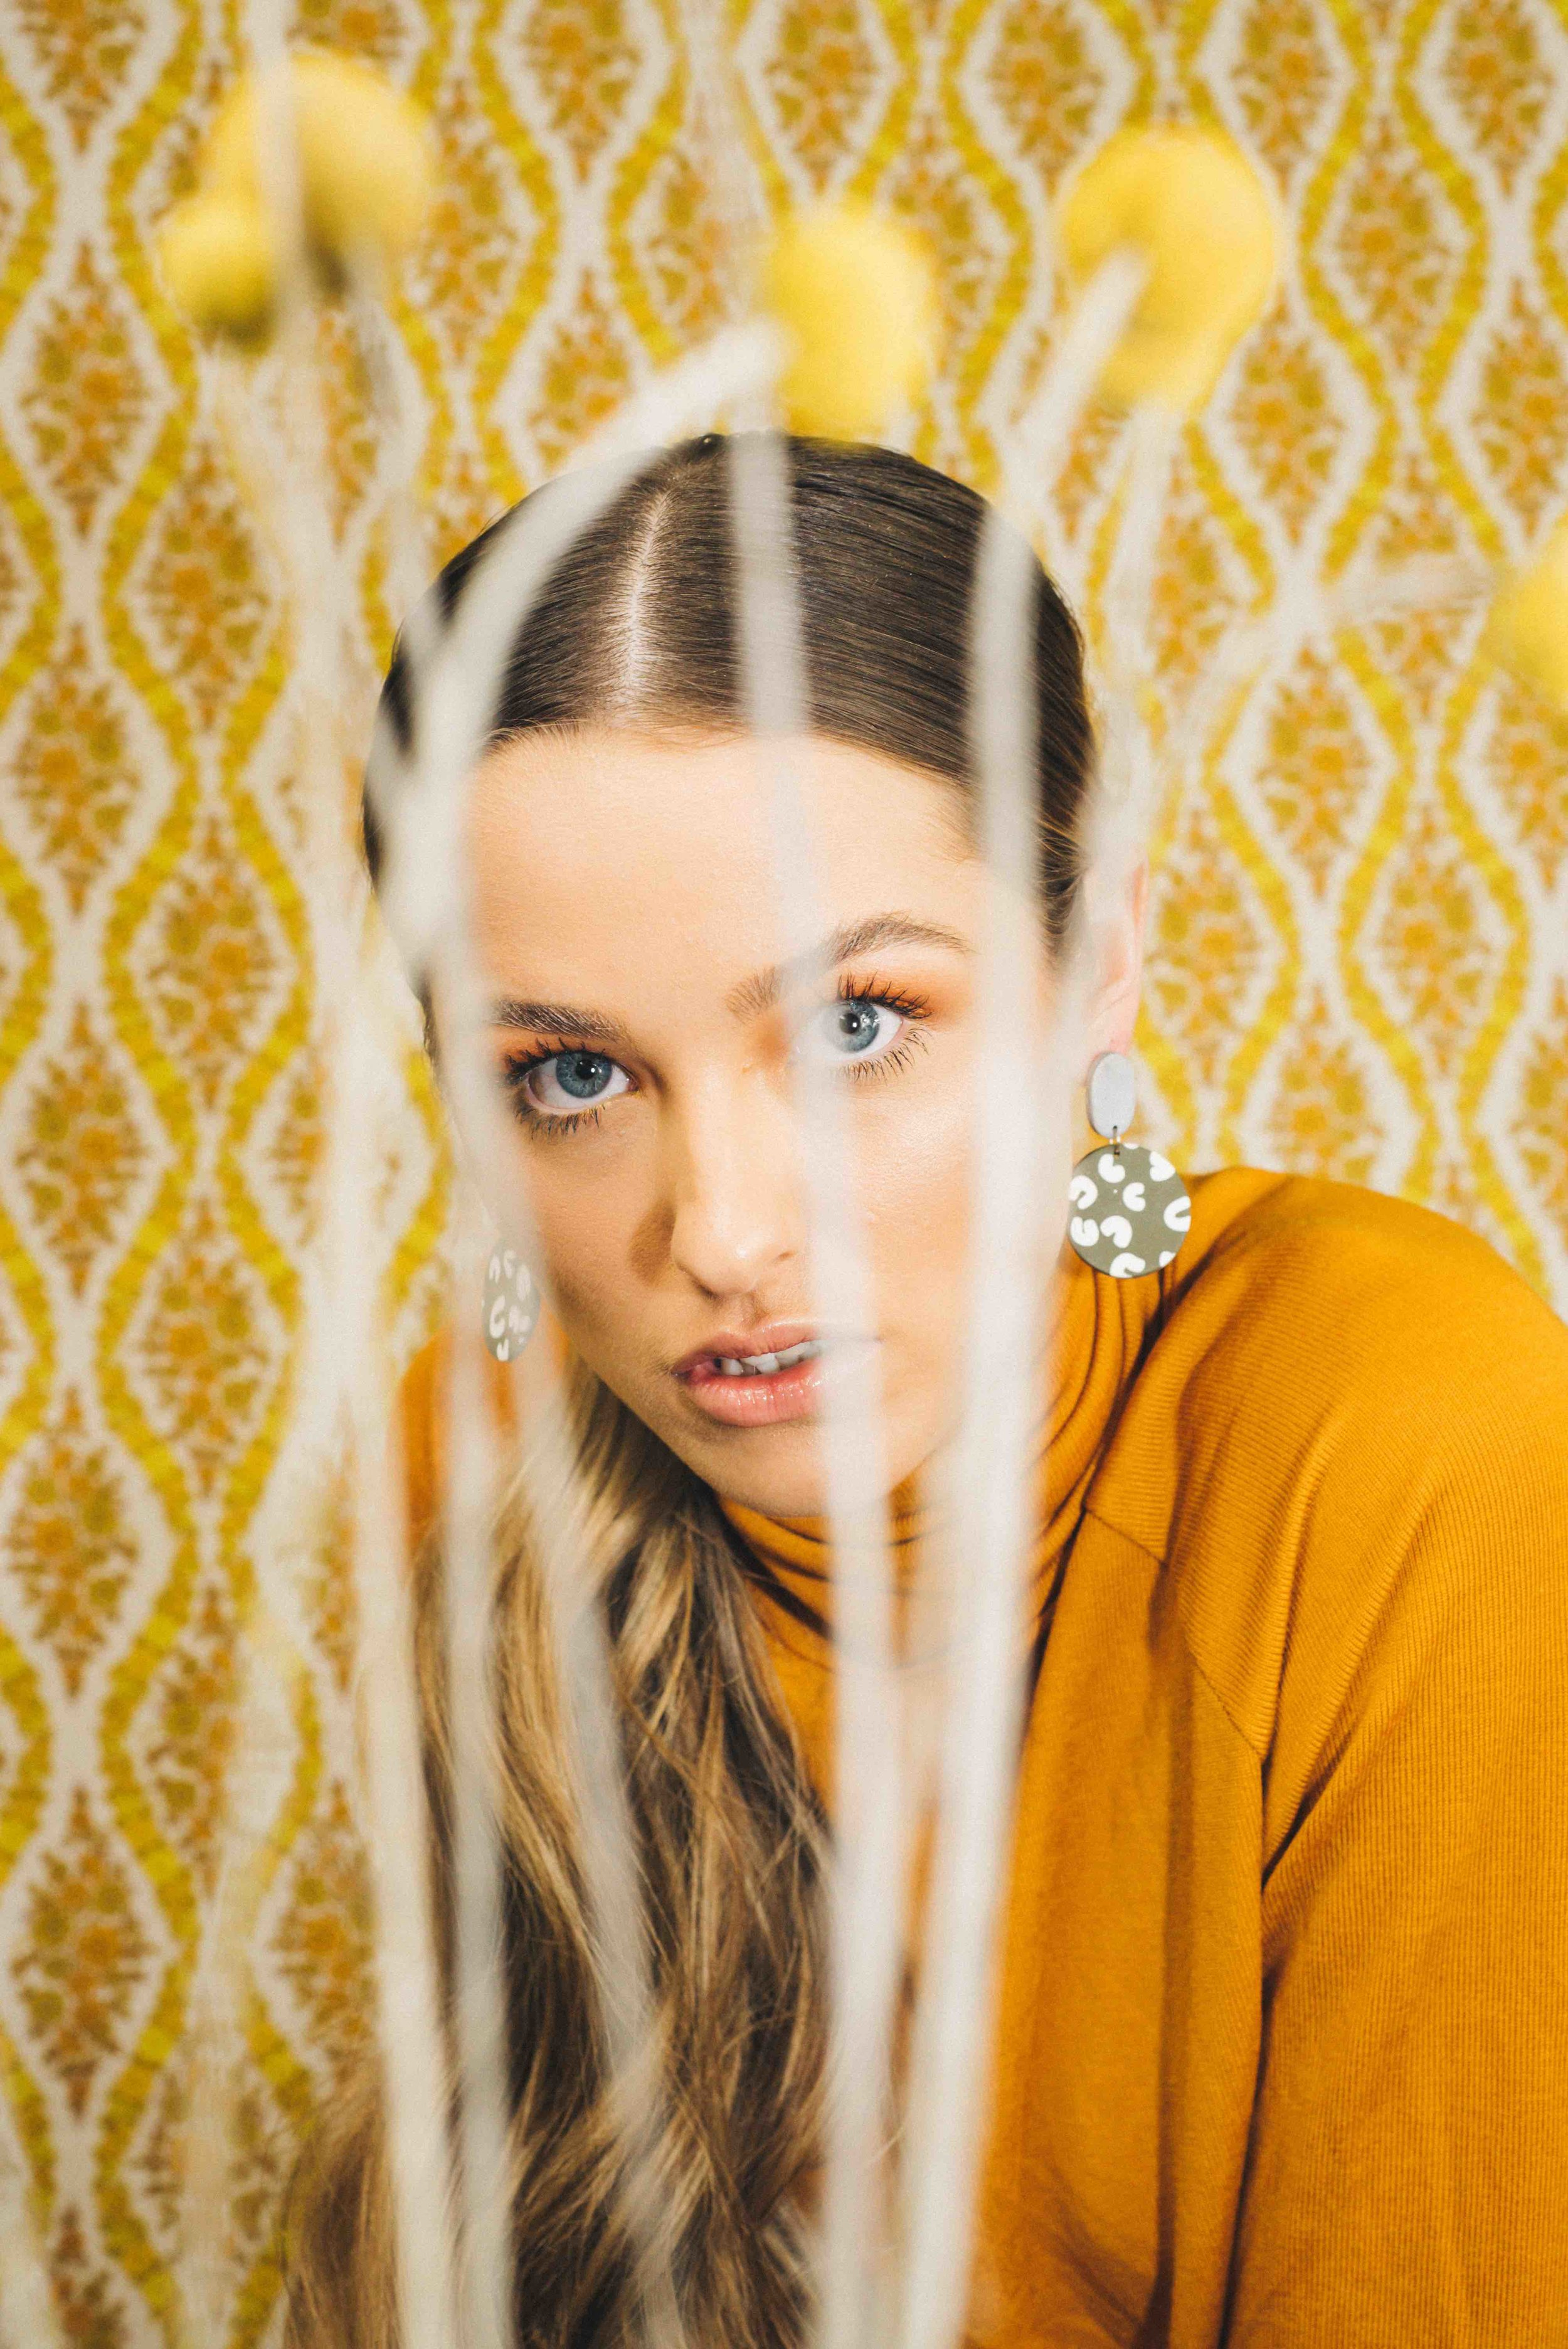 Images by Shannon Rose @getrosy_ // Model: Shayne Ivy Flint @shayneflintt